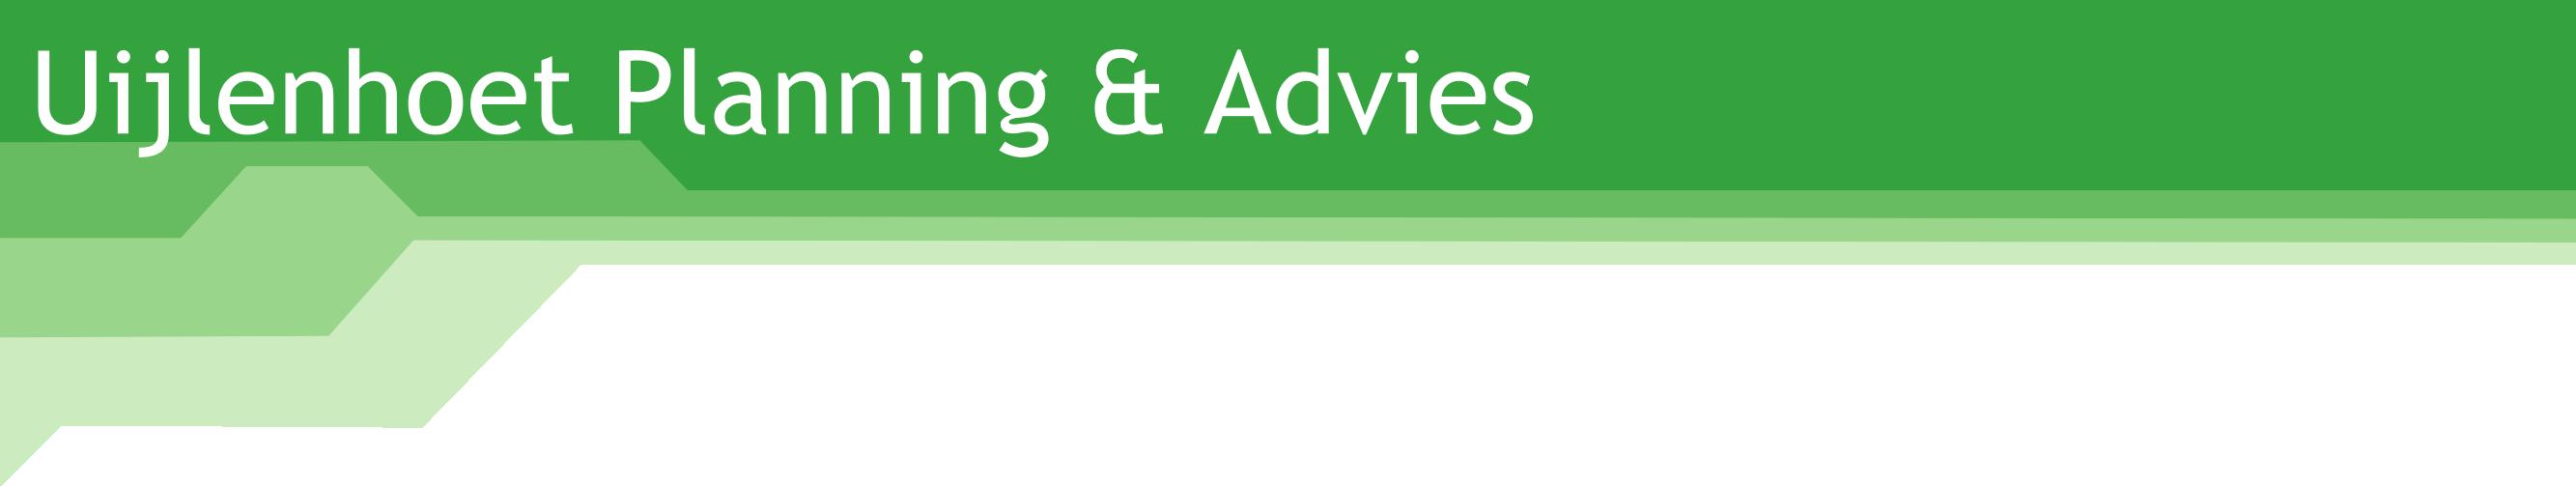 Uijlenhoet Planning & Advies